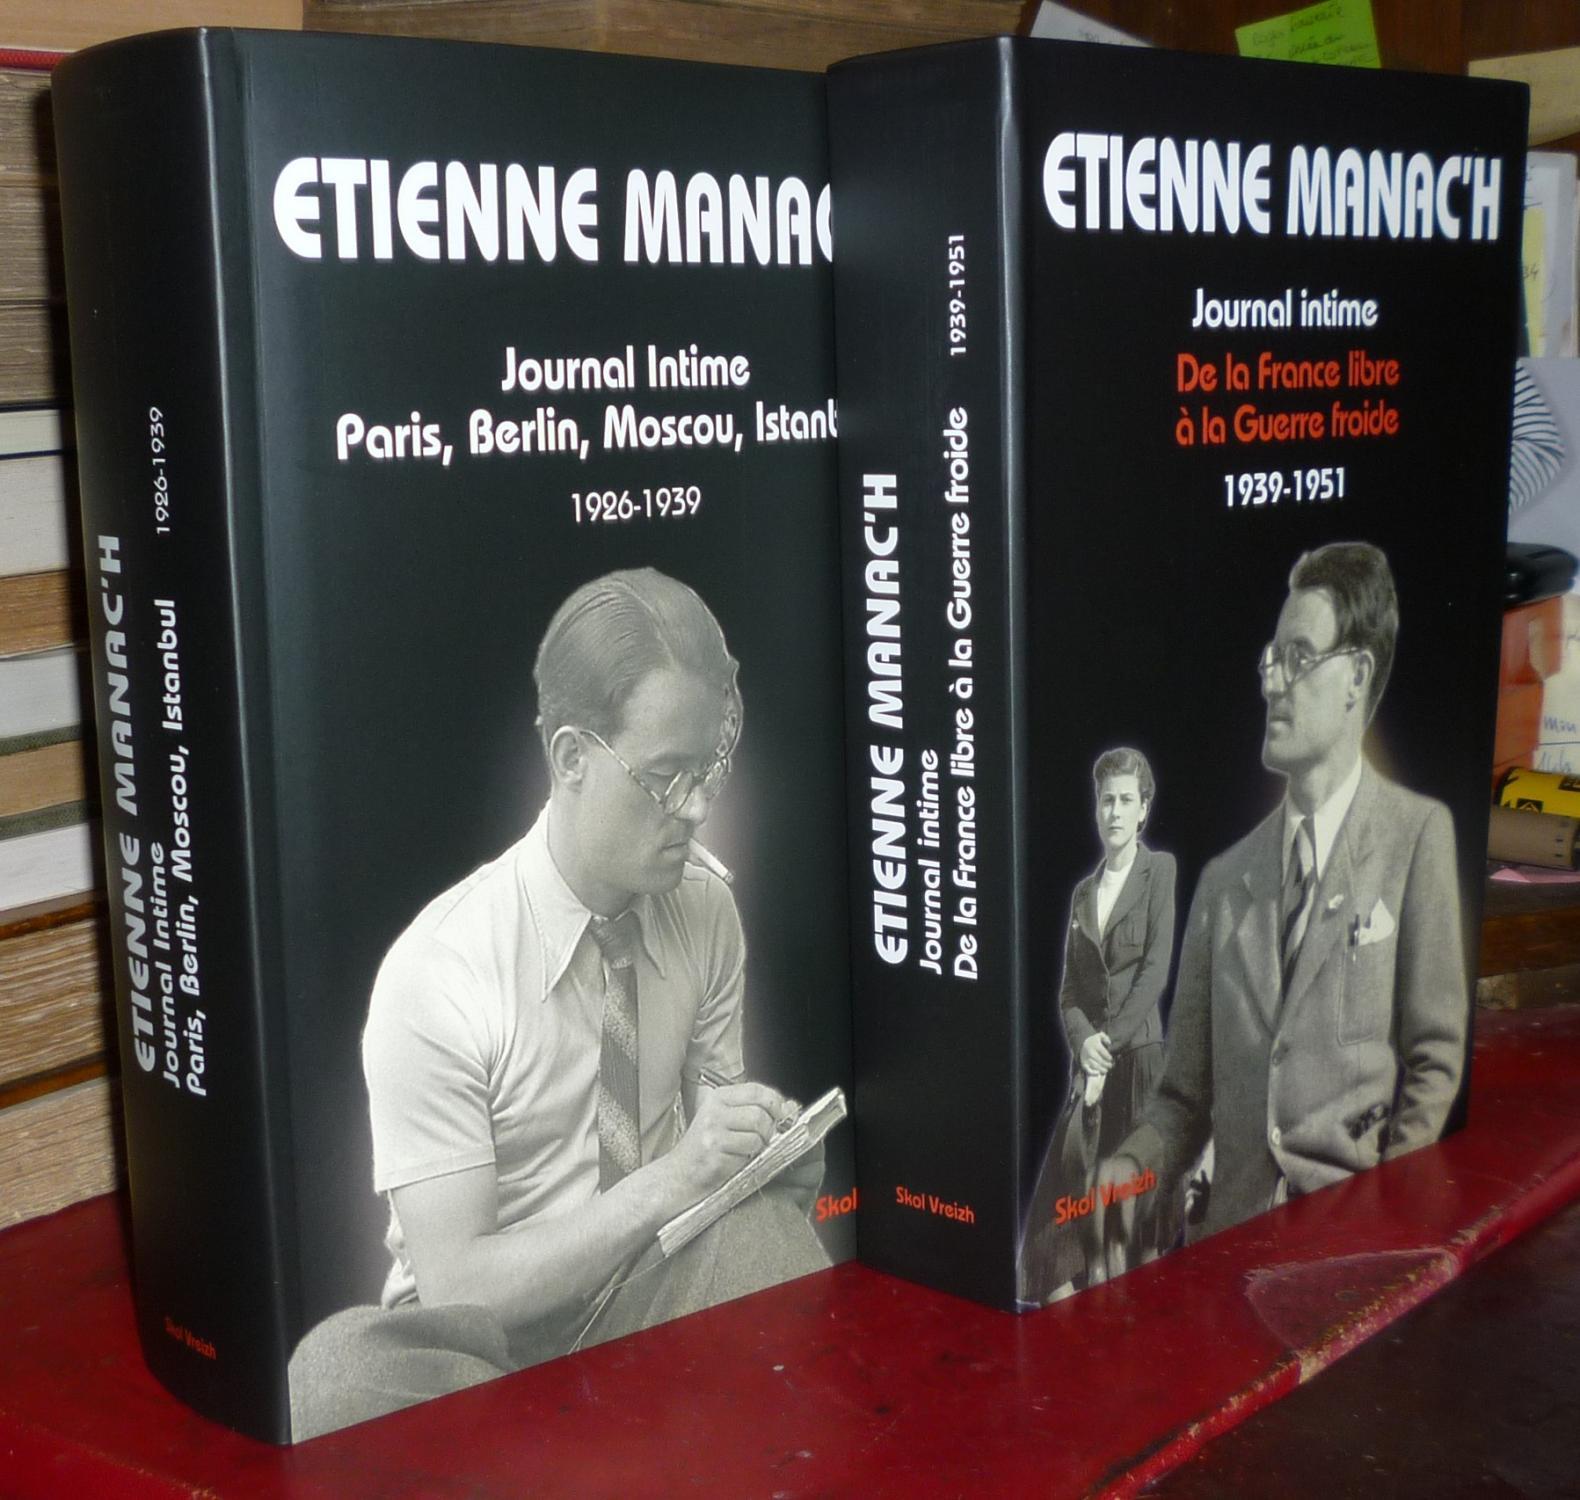 JOURNAL INTIME - PARIS, BERLIN, MOSCOU, ISTAMBUL - 1926